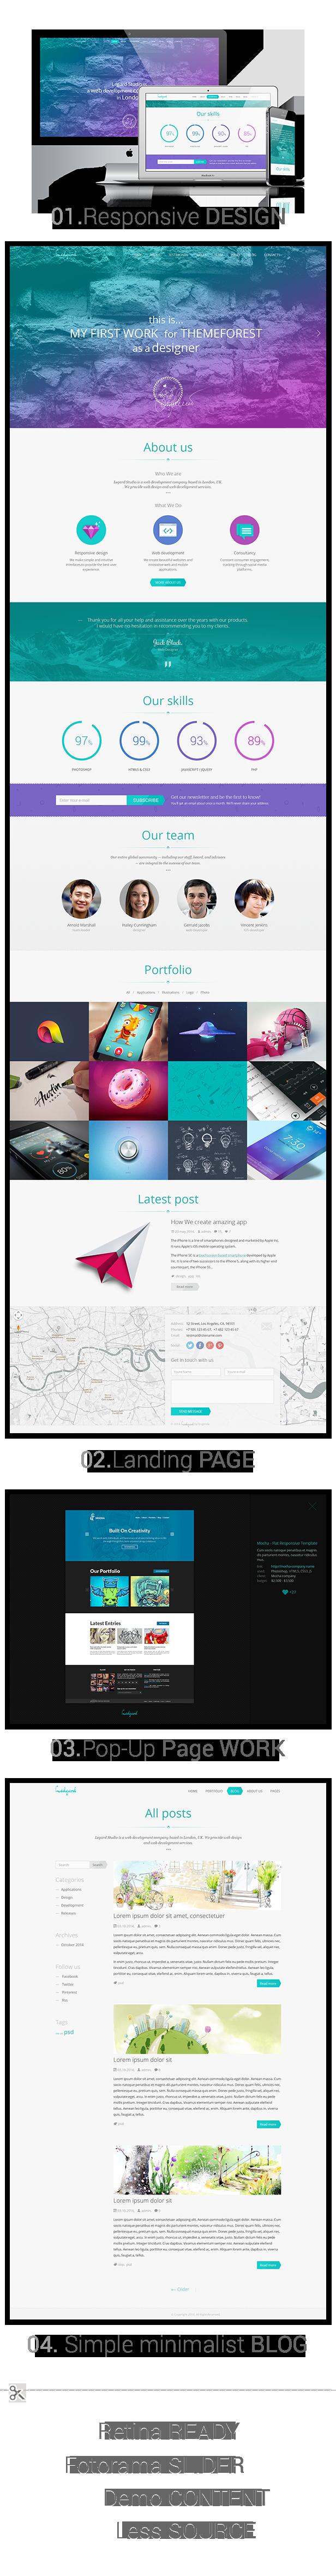 Ledgard WP - Clean Responsive Landing Page + Blog